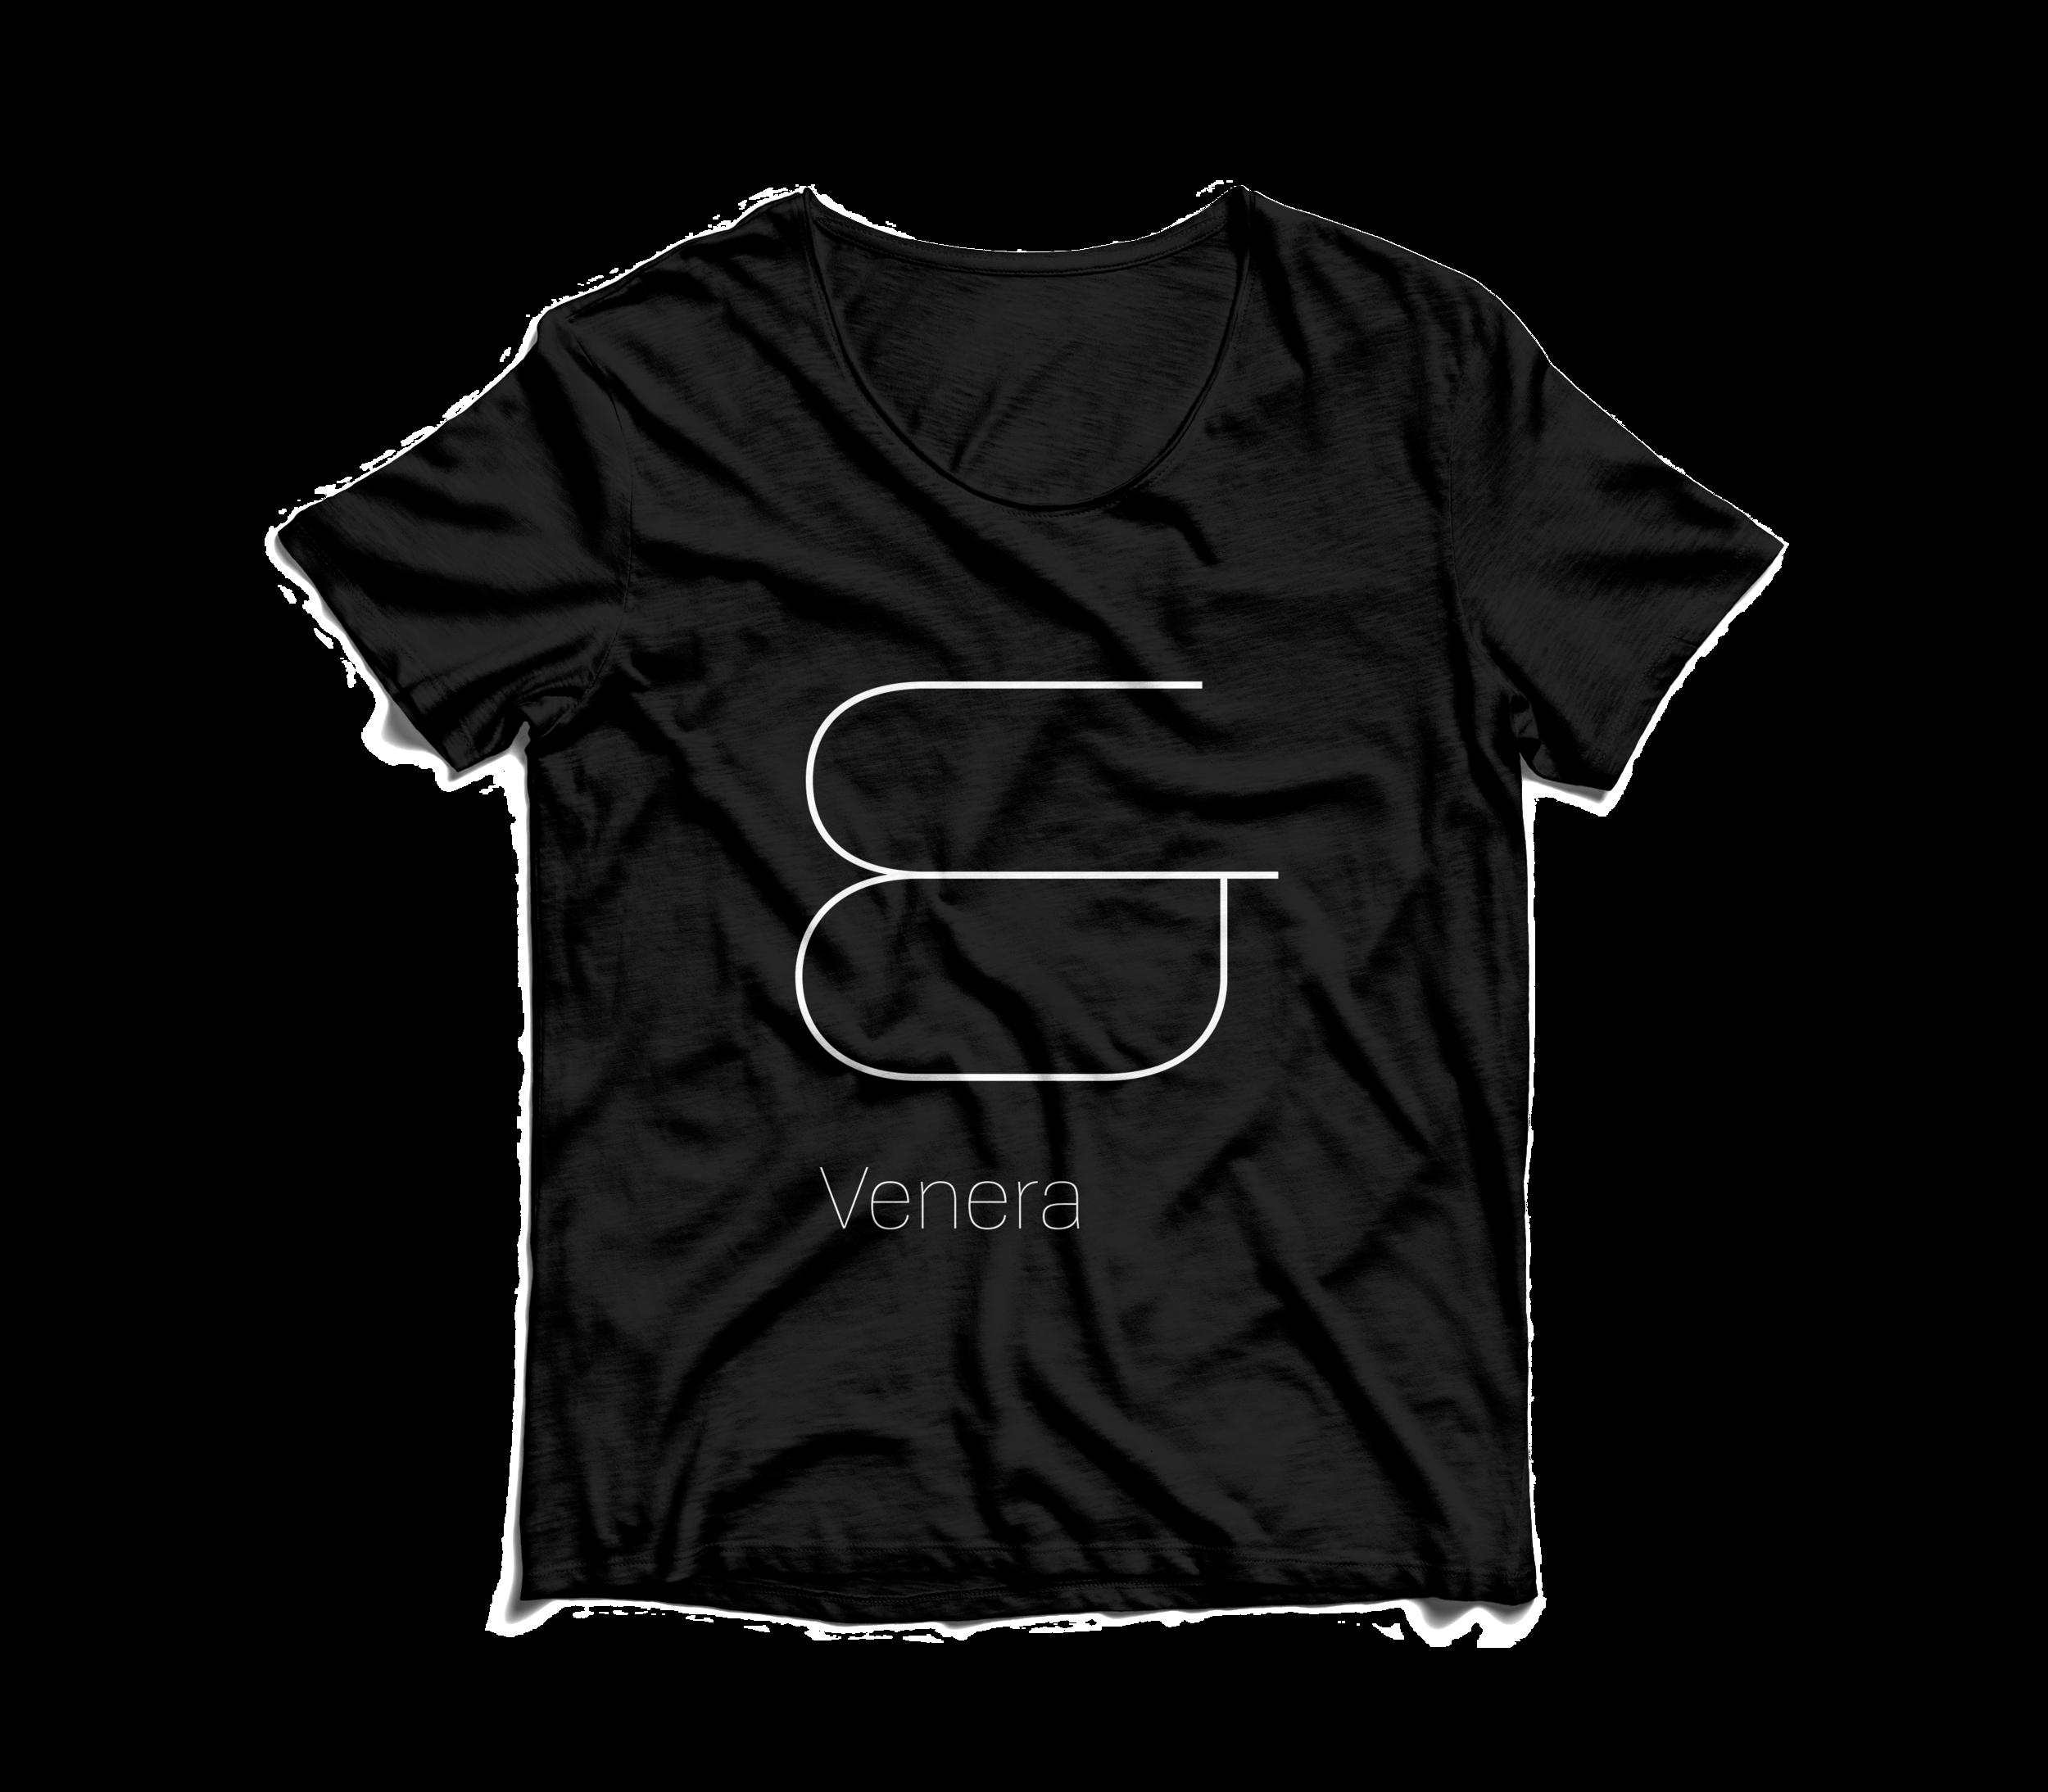 venera ampersand tshirt.png